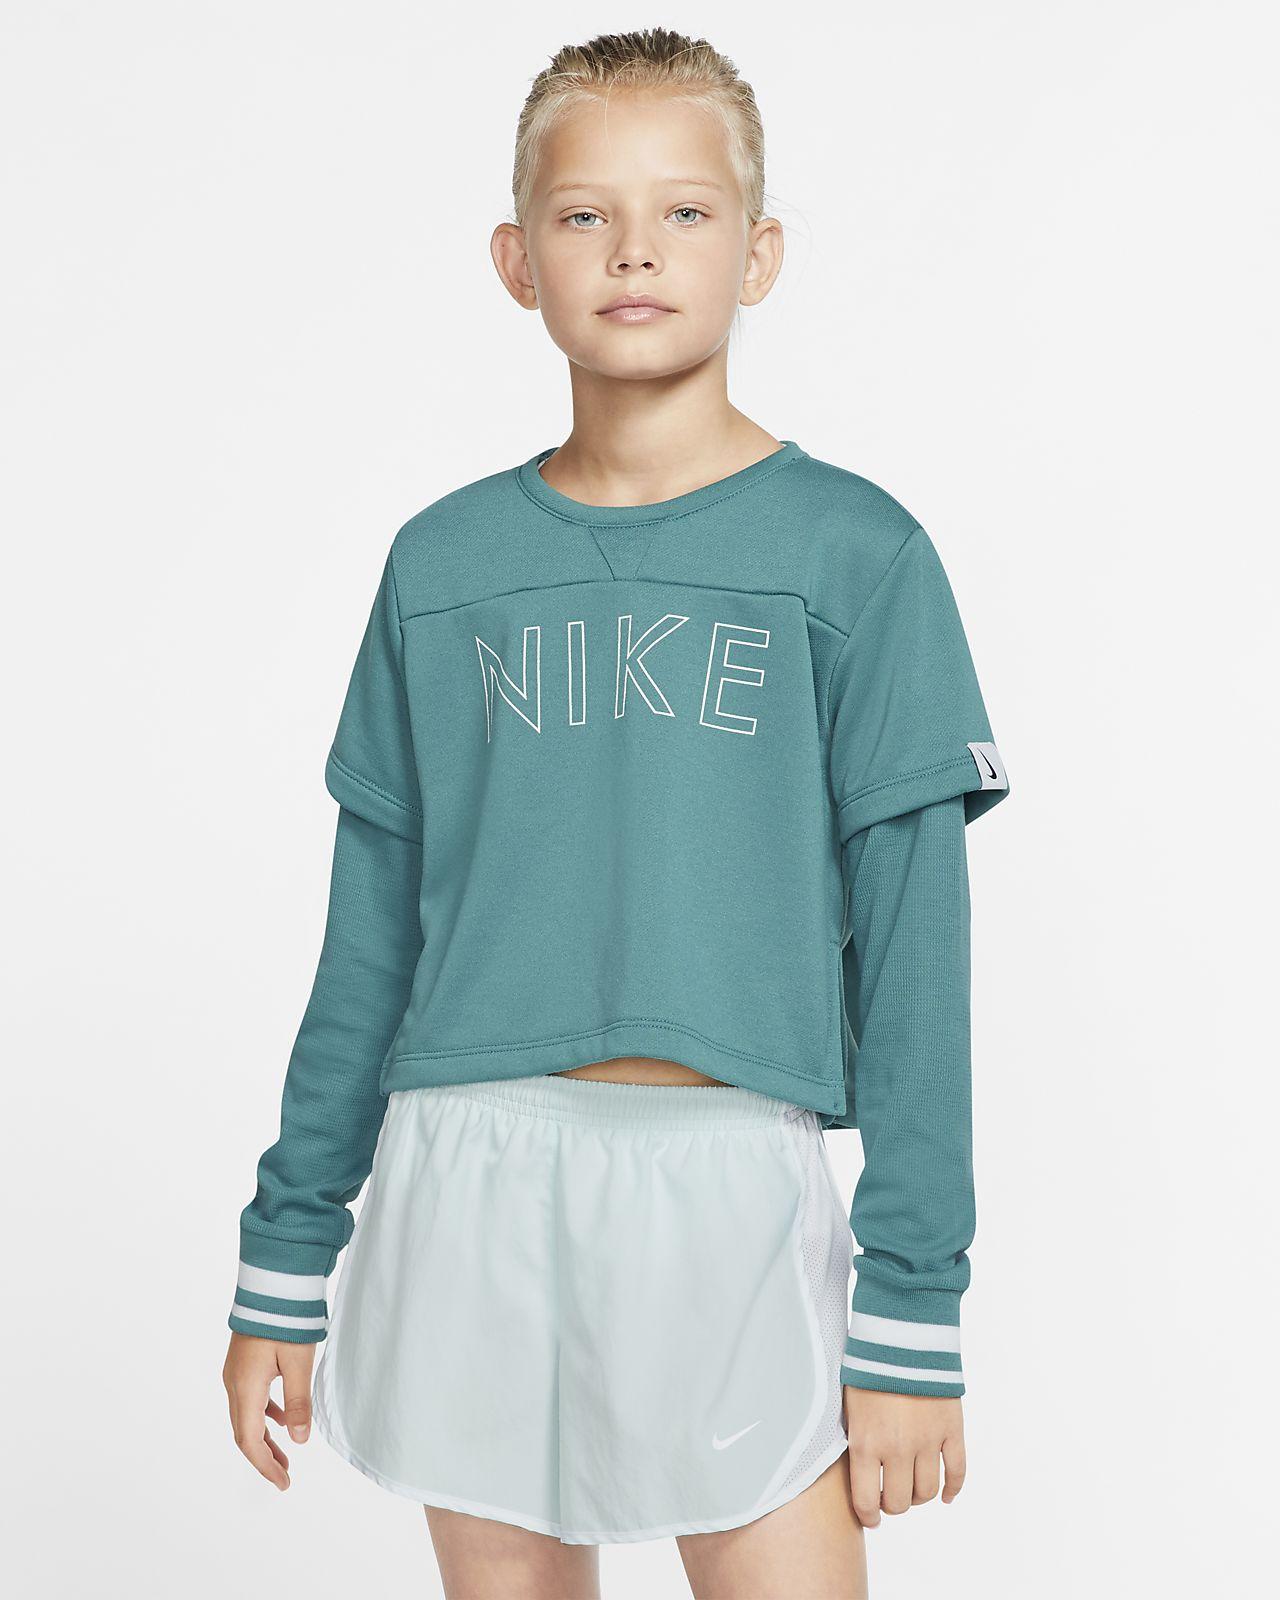 Nike Studio Big Kids' (Girls') Long-Sleeve Training Top